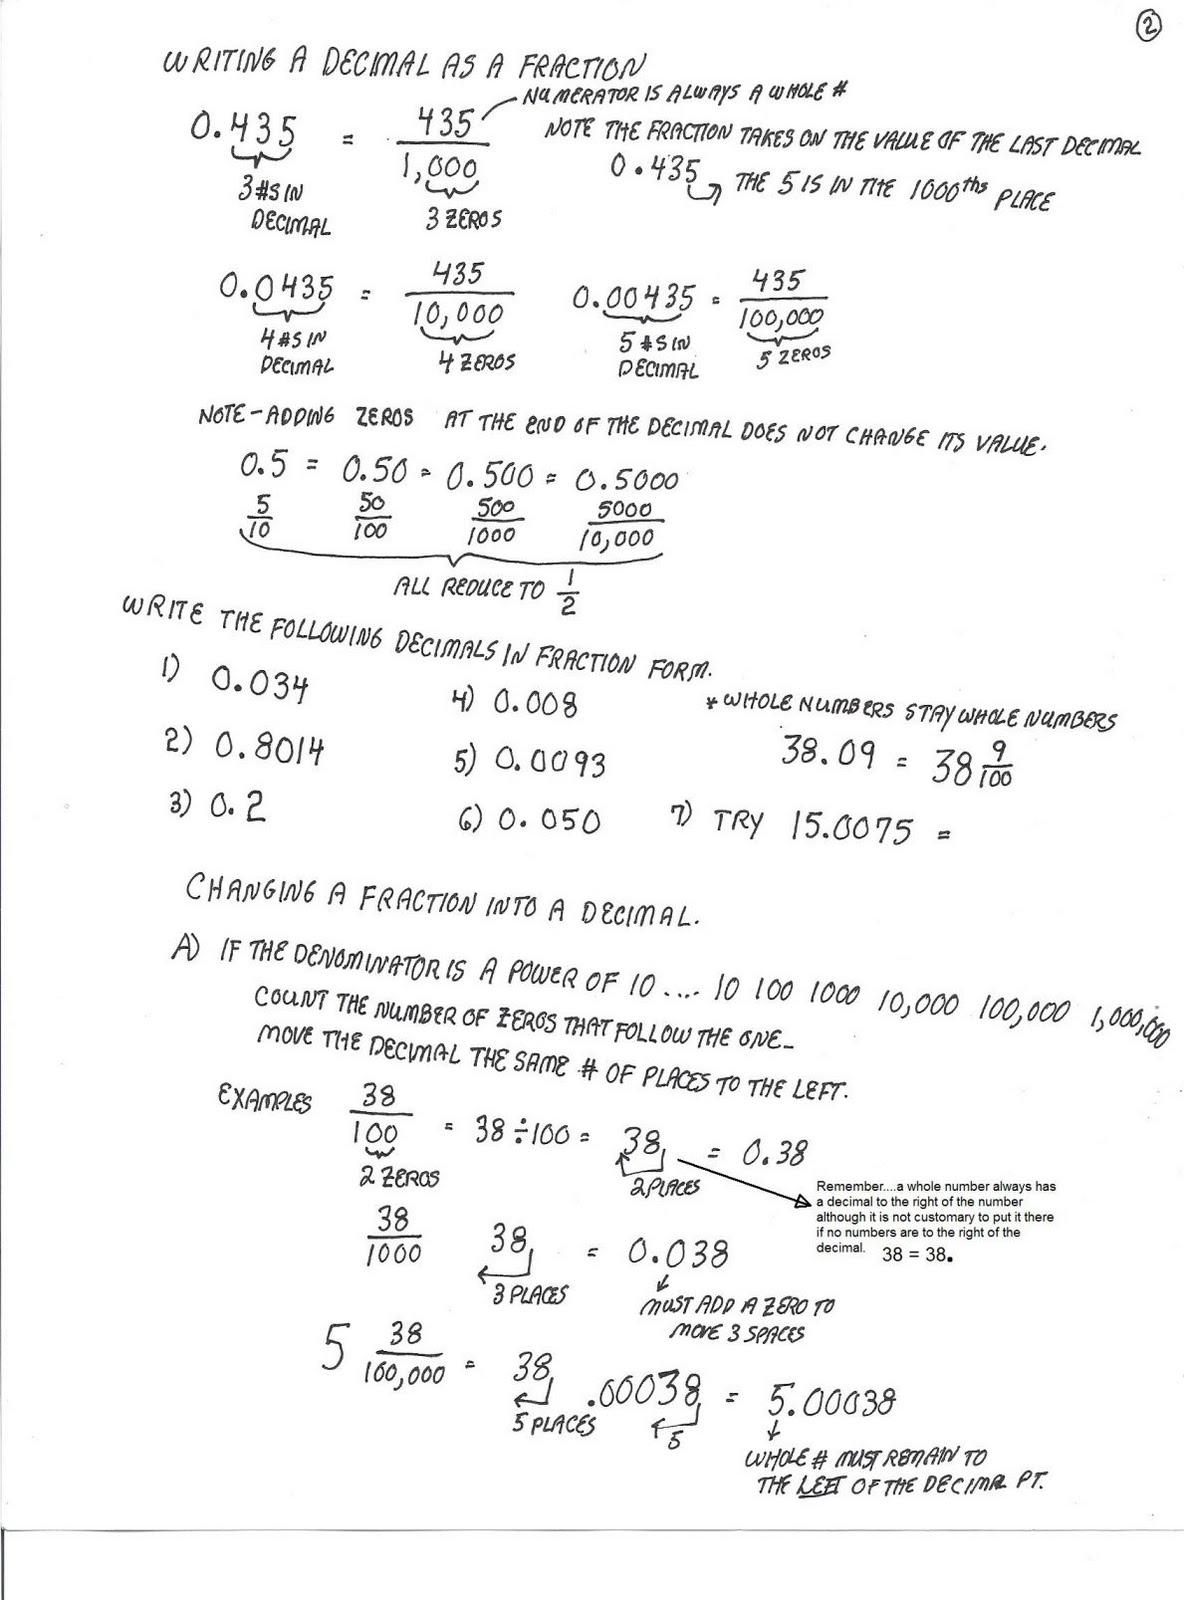 Cobb Adult Ed Math Decimal Notes And Worksheet